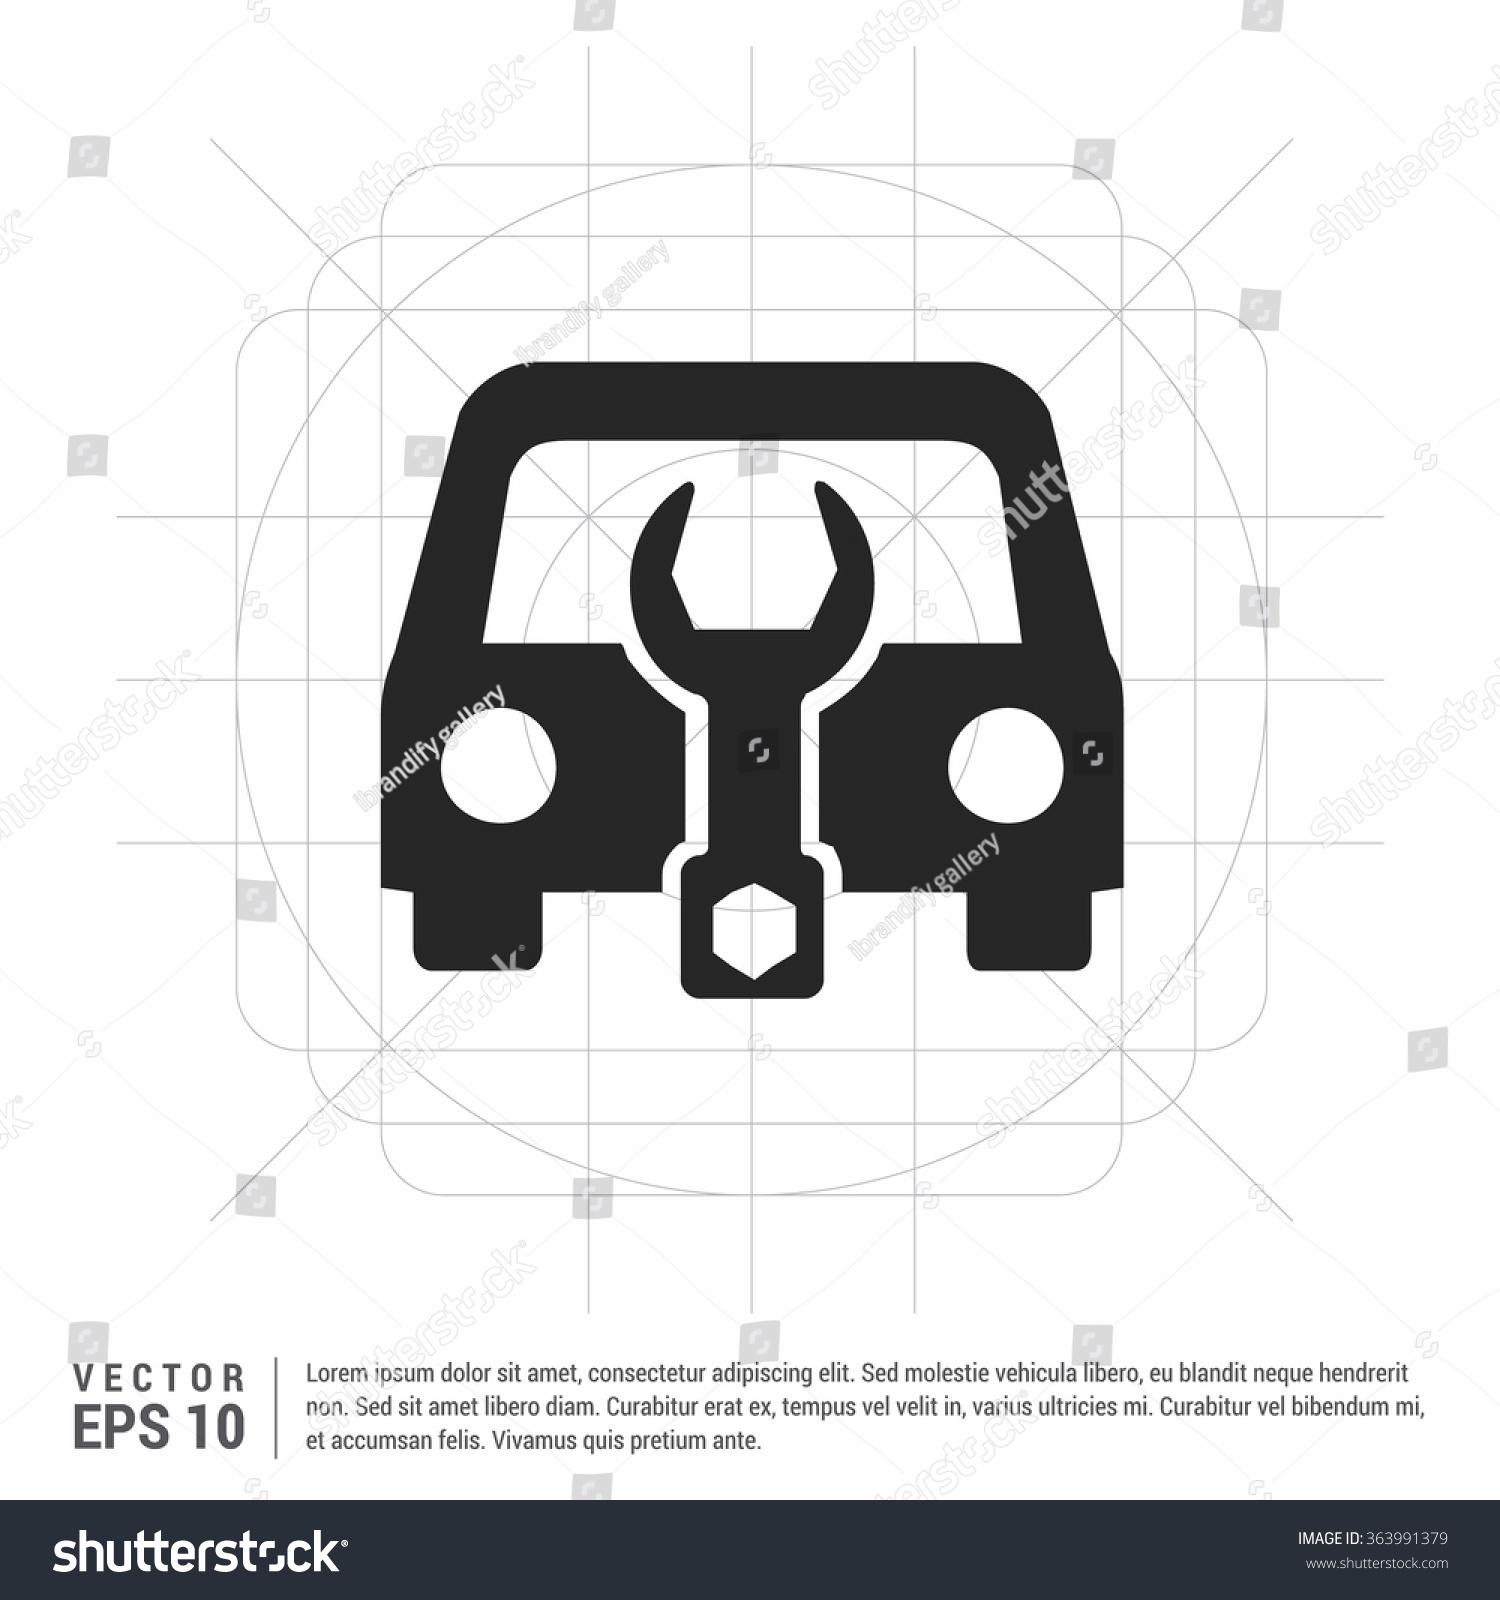 Vector auto workshop icon stock vector 363991379 shutterstock vector auto workshop icon biocorpaavc